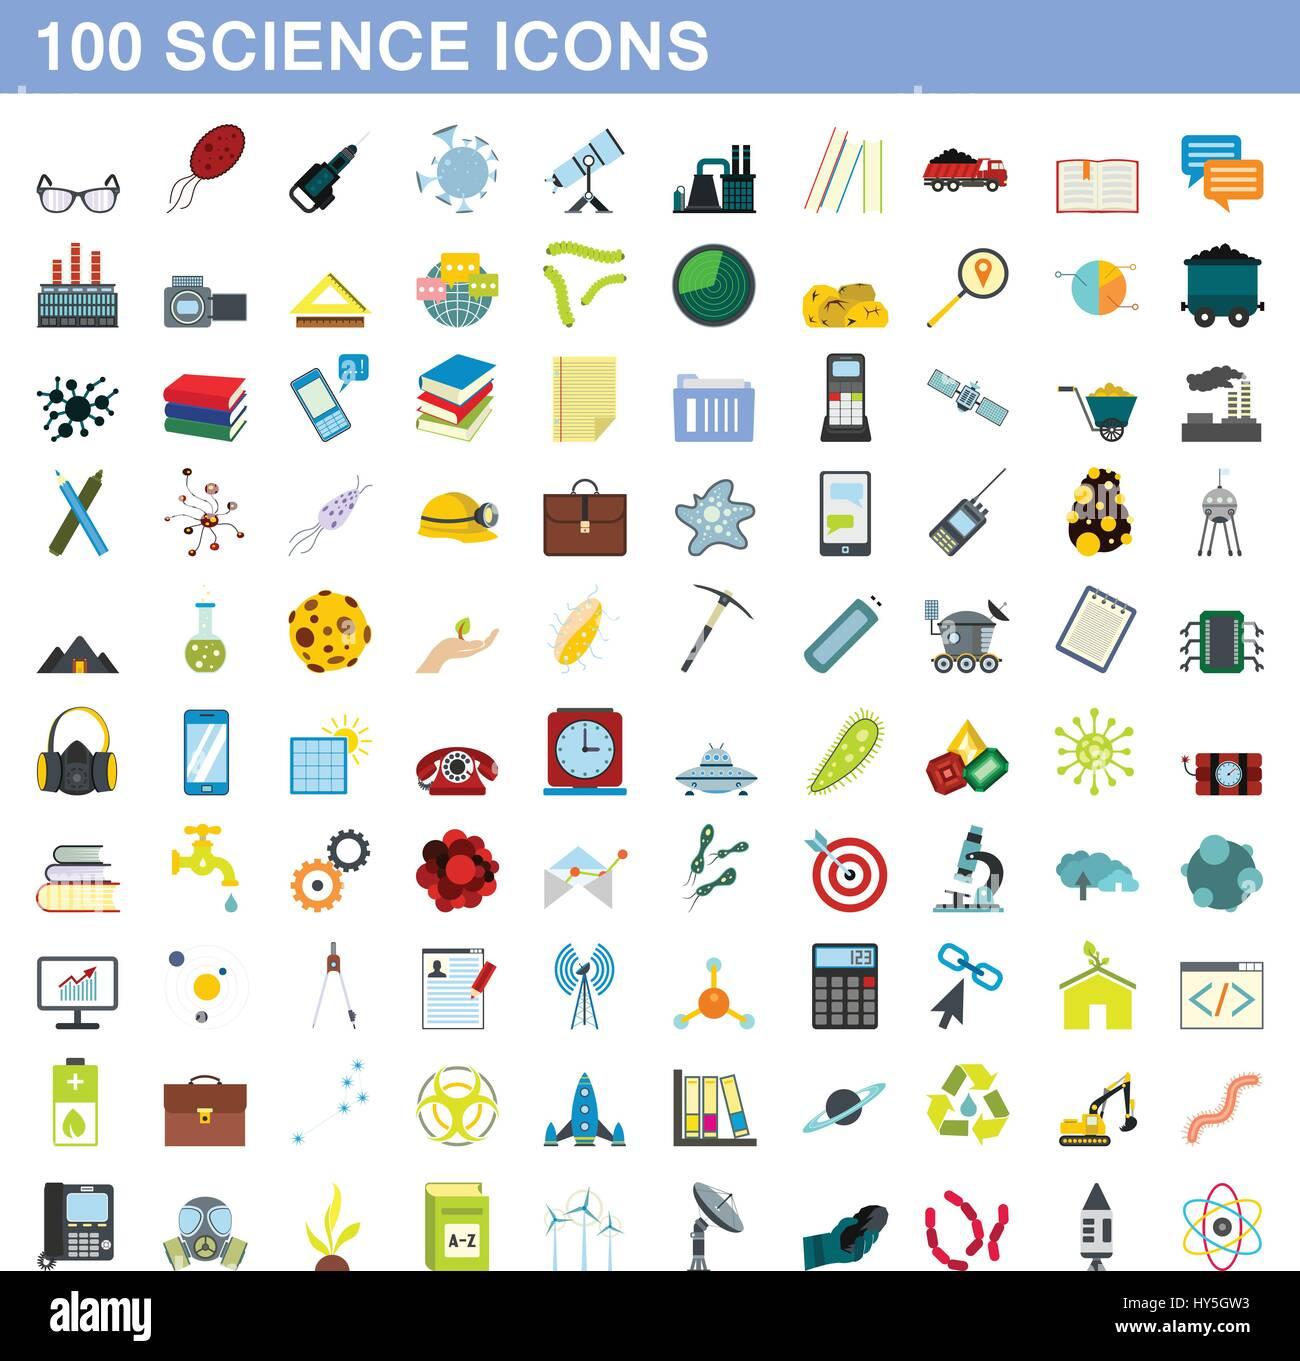 100 science icons set, flat style - Stock Image